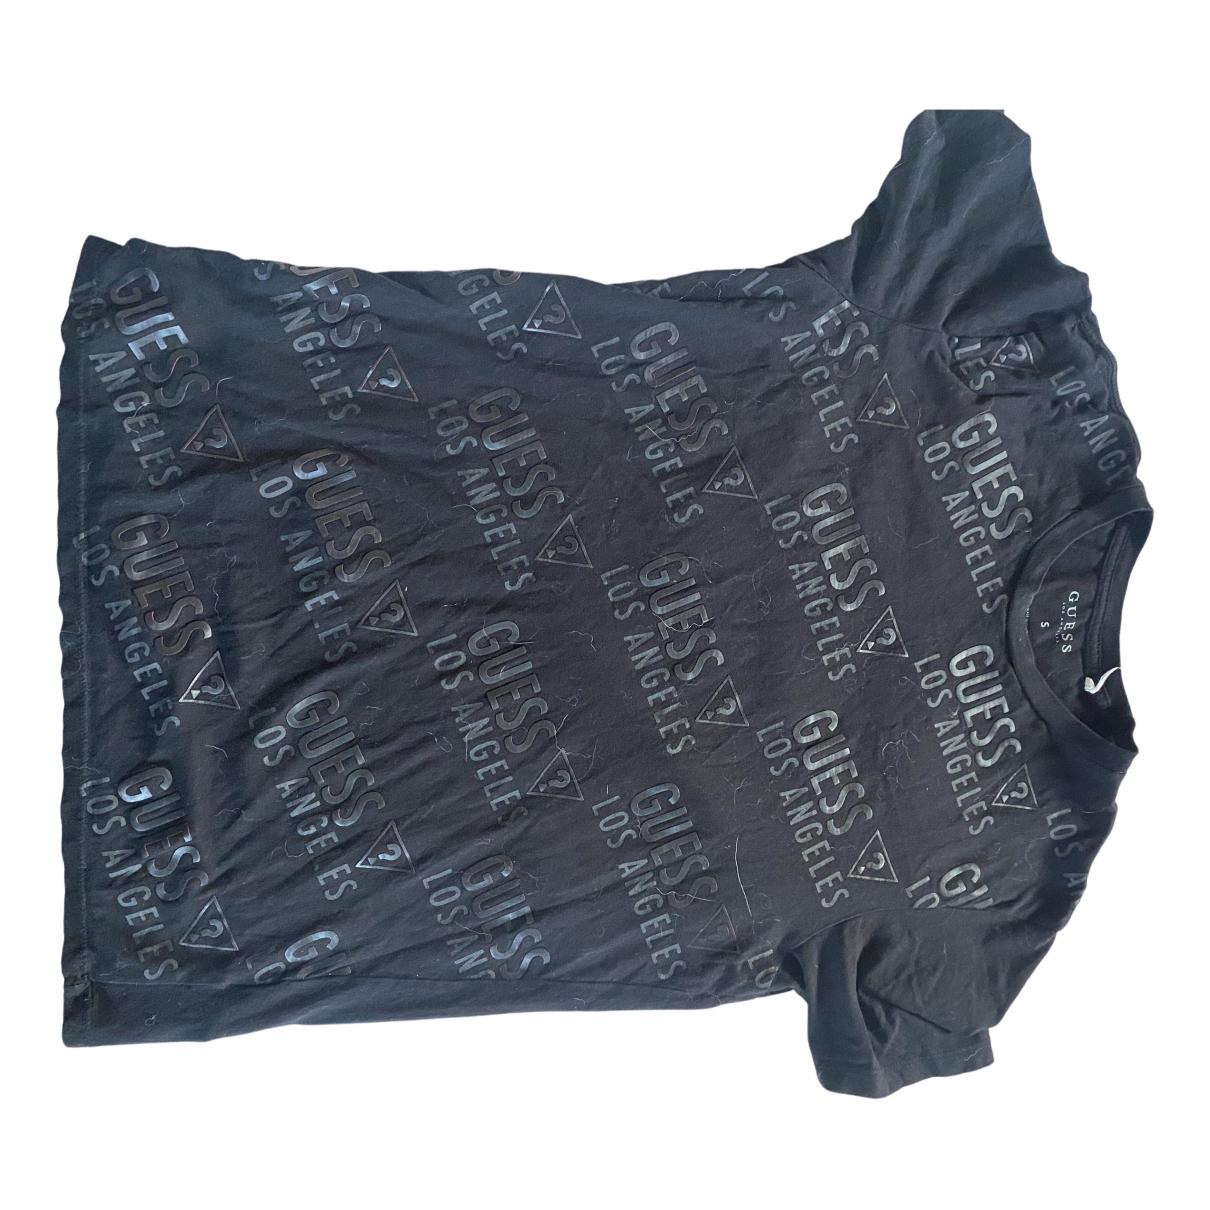 Guess - Tee shirts   pour homme - noir